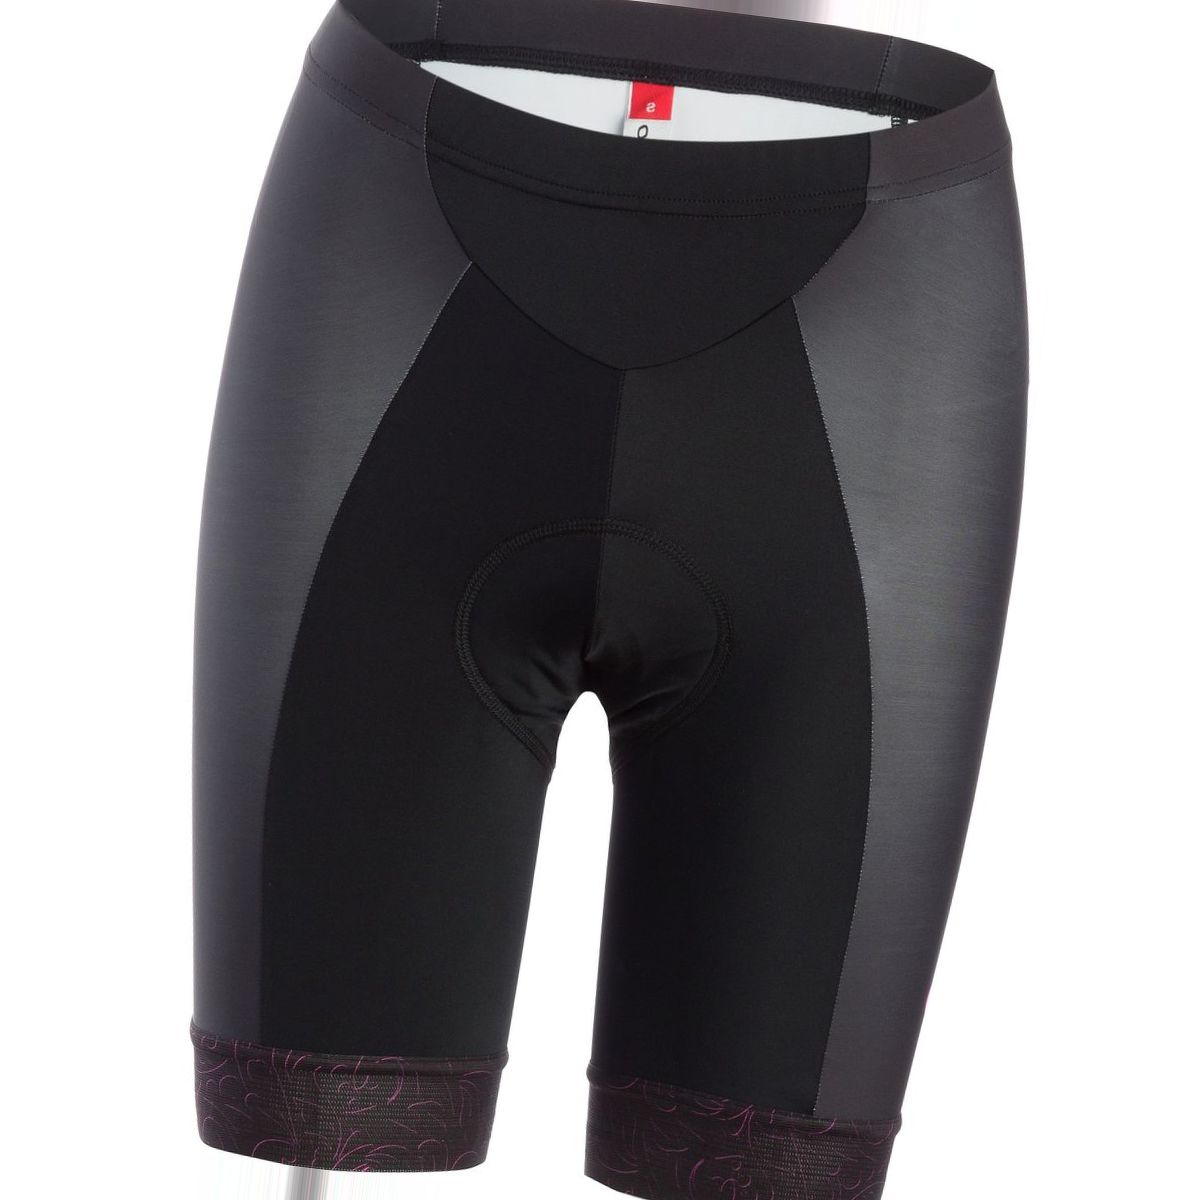 Pinarello Strada Bib Short - Women's